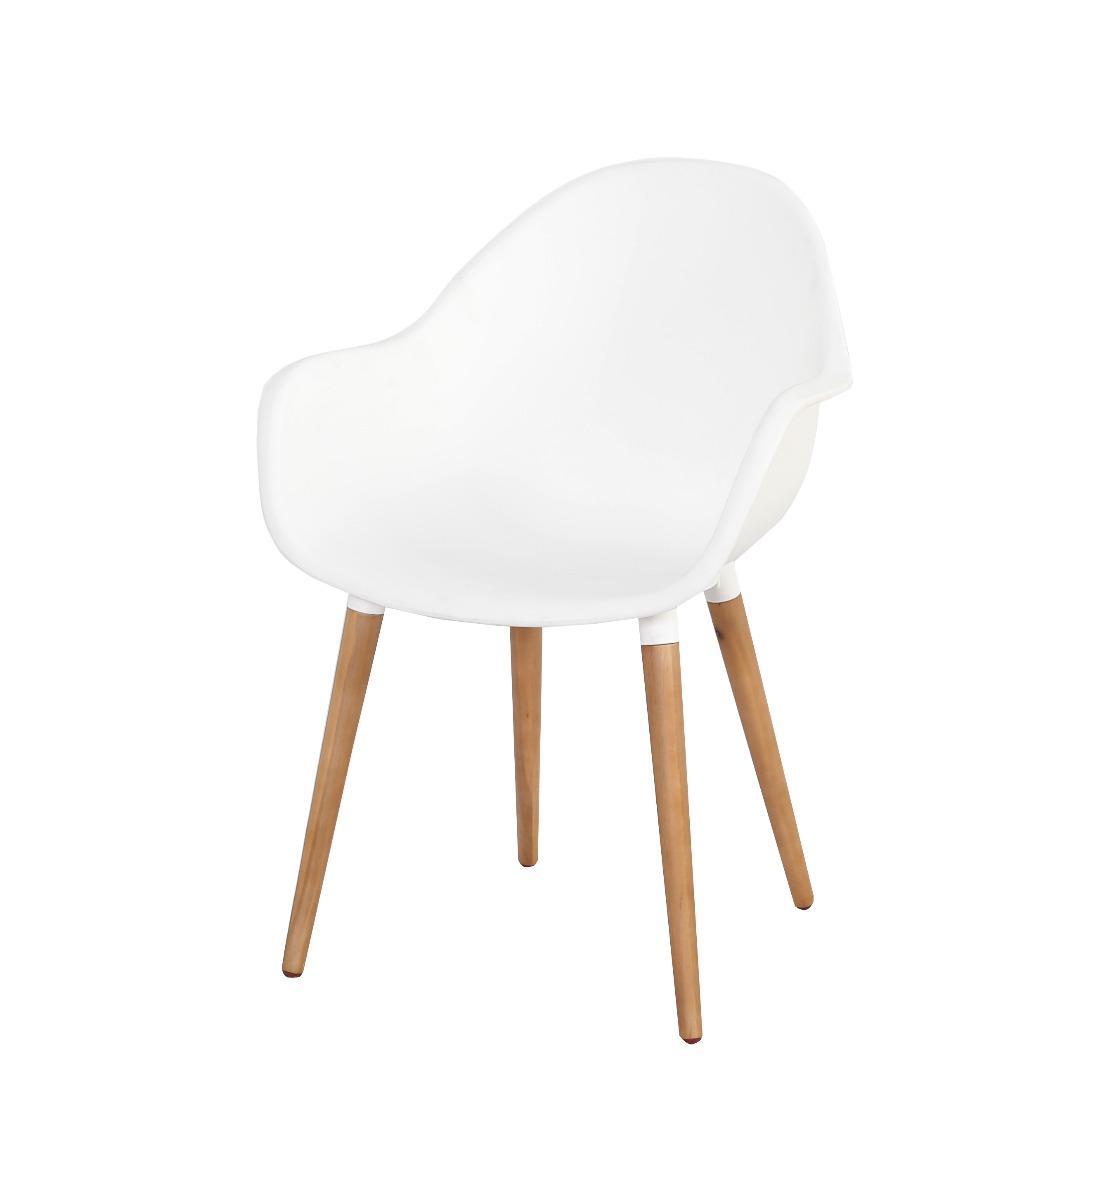 Korting Annestad dining chair